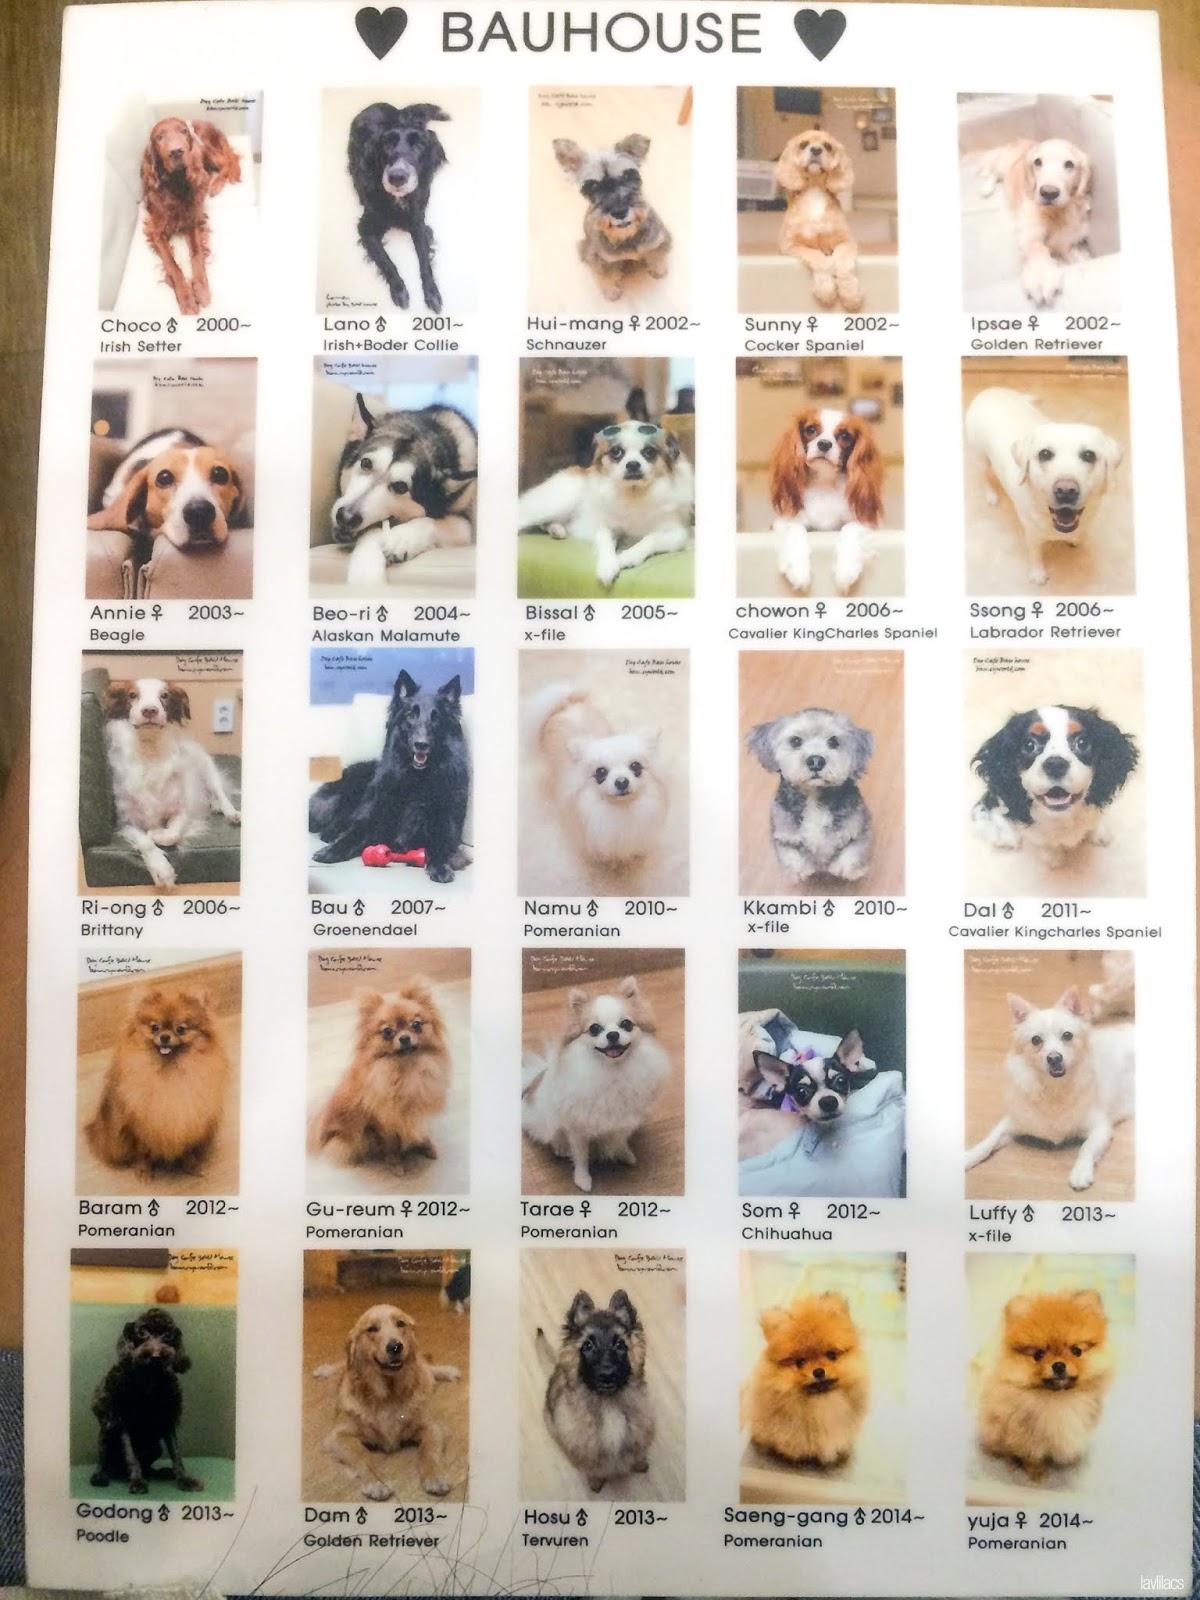 Seoul, Korea - Summer Study Abroad 2014 - Bauhaus Dog Cafe resident dogs